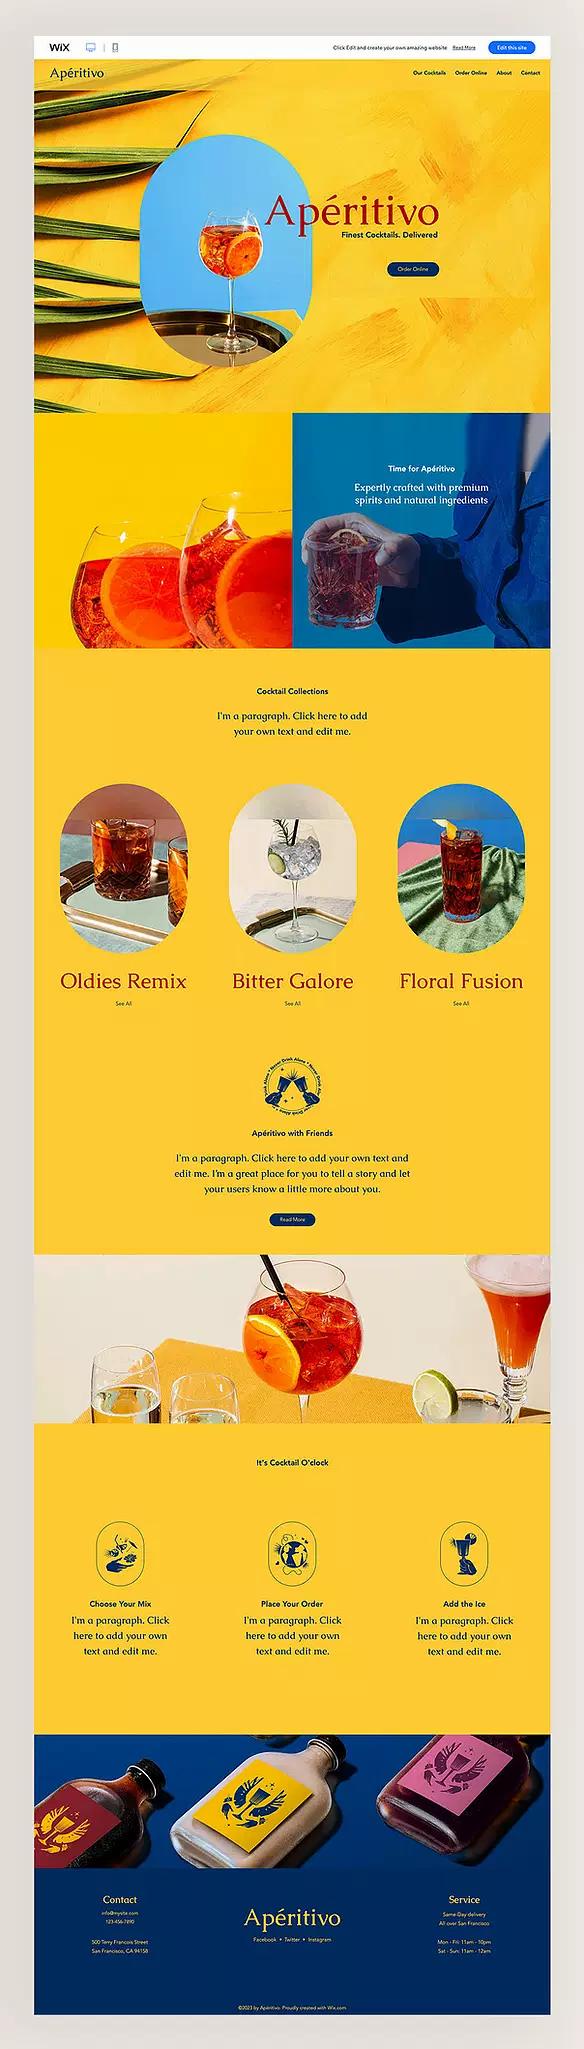 Template di siti belli creati con Wix per cocktail